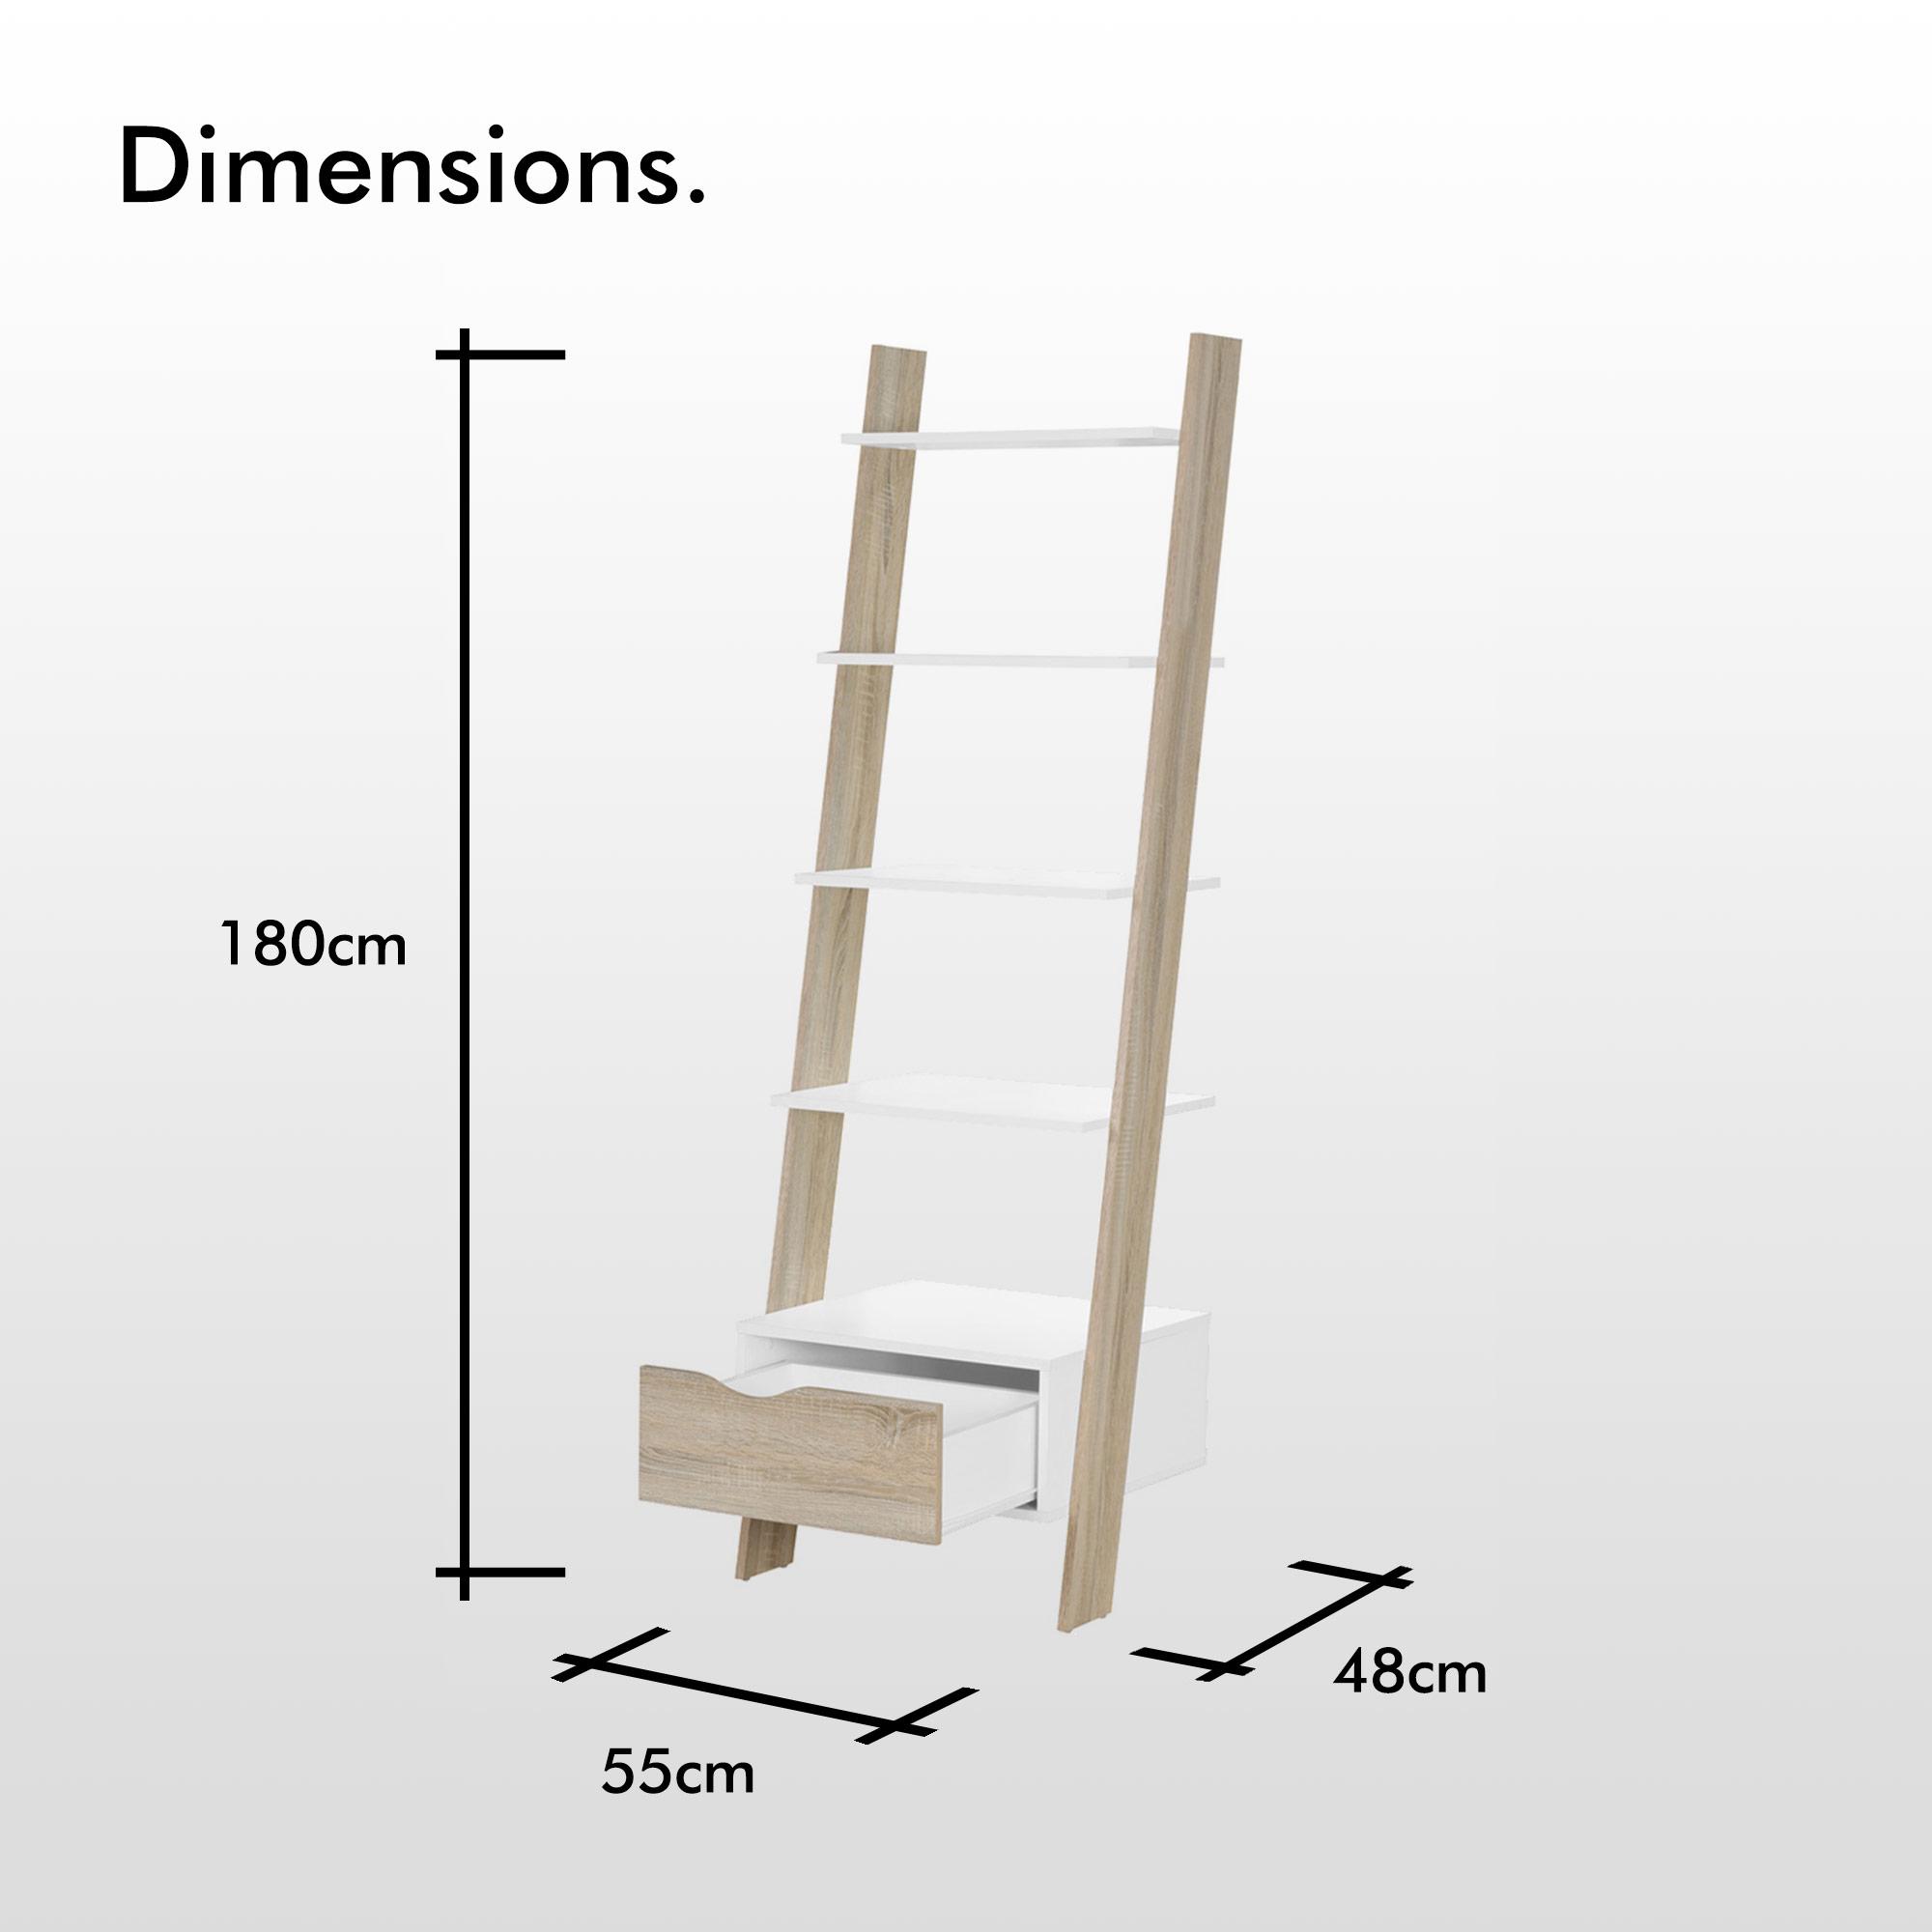 separation shoes 2bca7 071ed Details about VonHaus Ladder Bookcase Scandinavian Nordic White and Light  Oak Effect Bookshelf